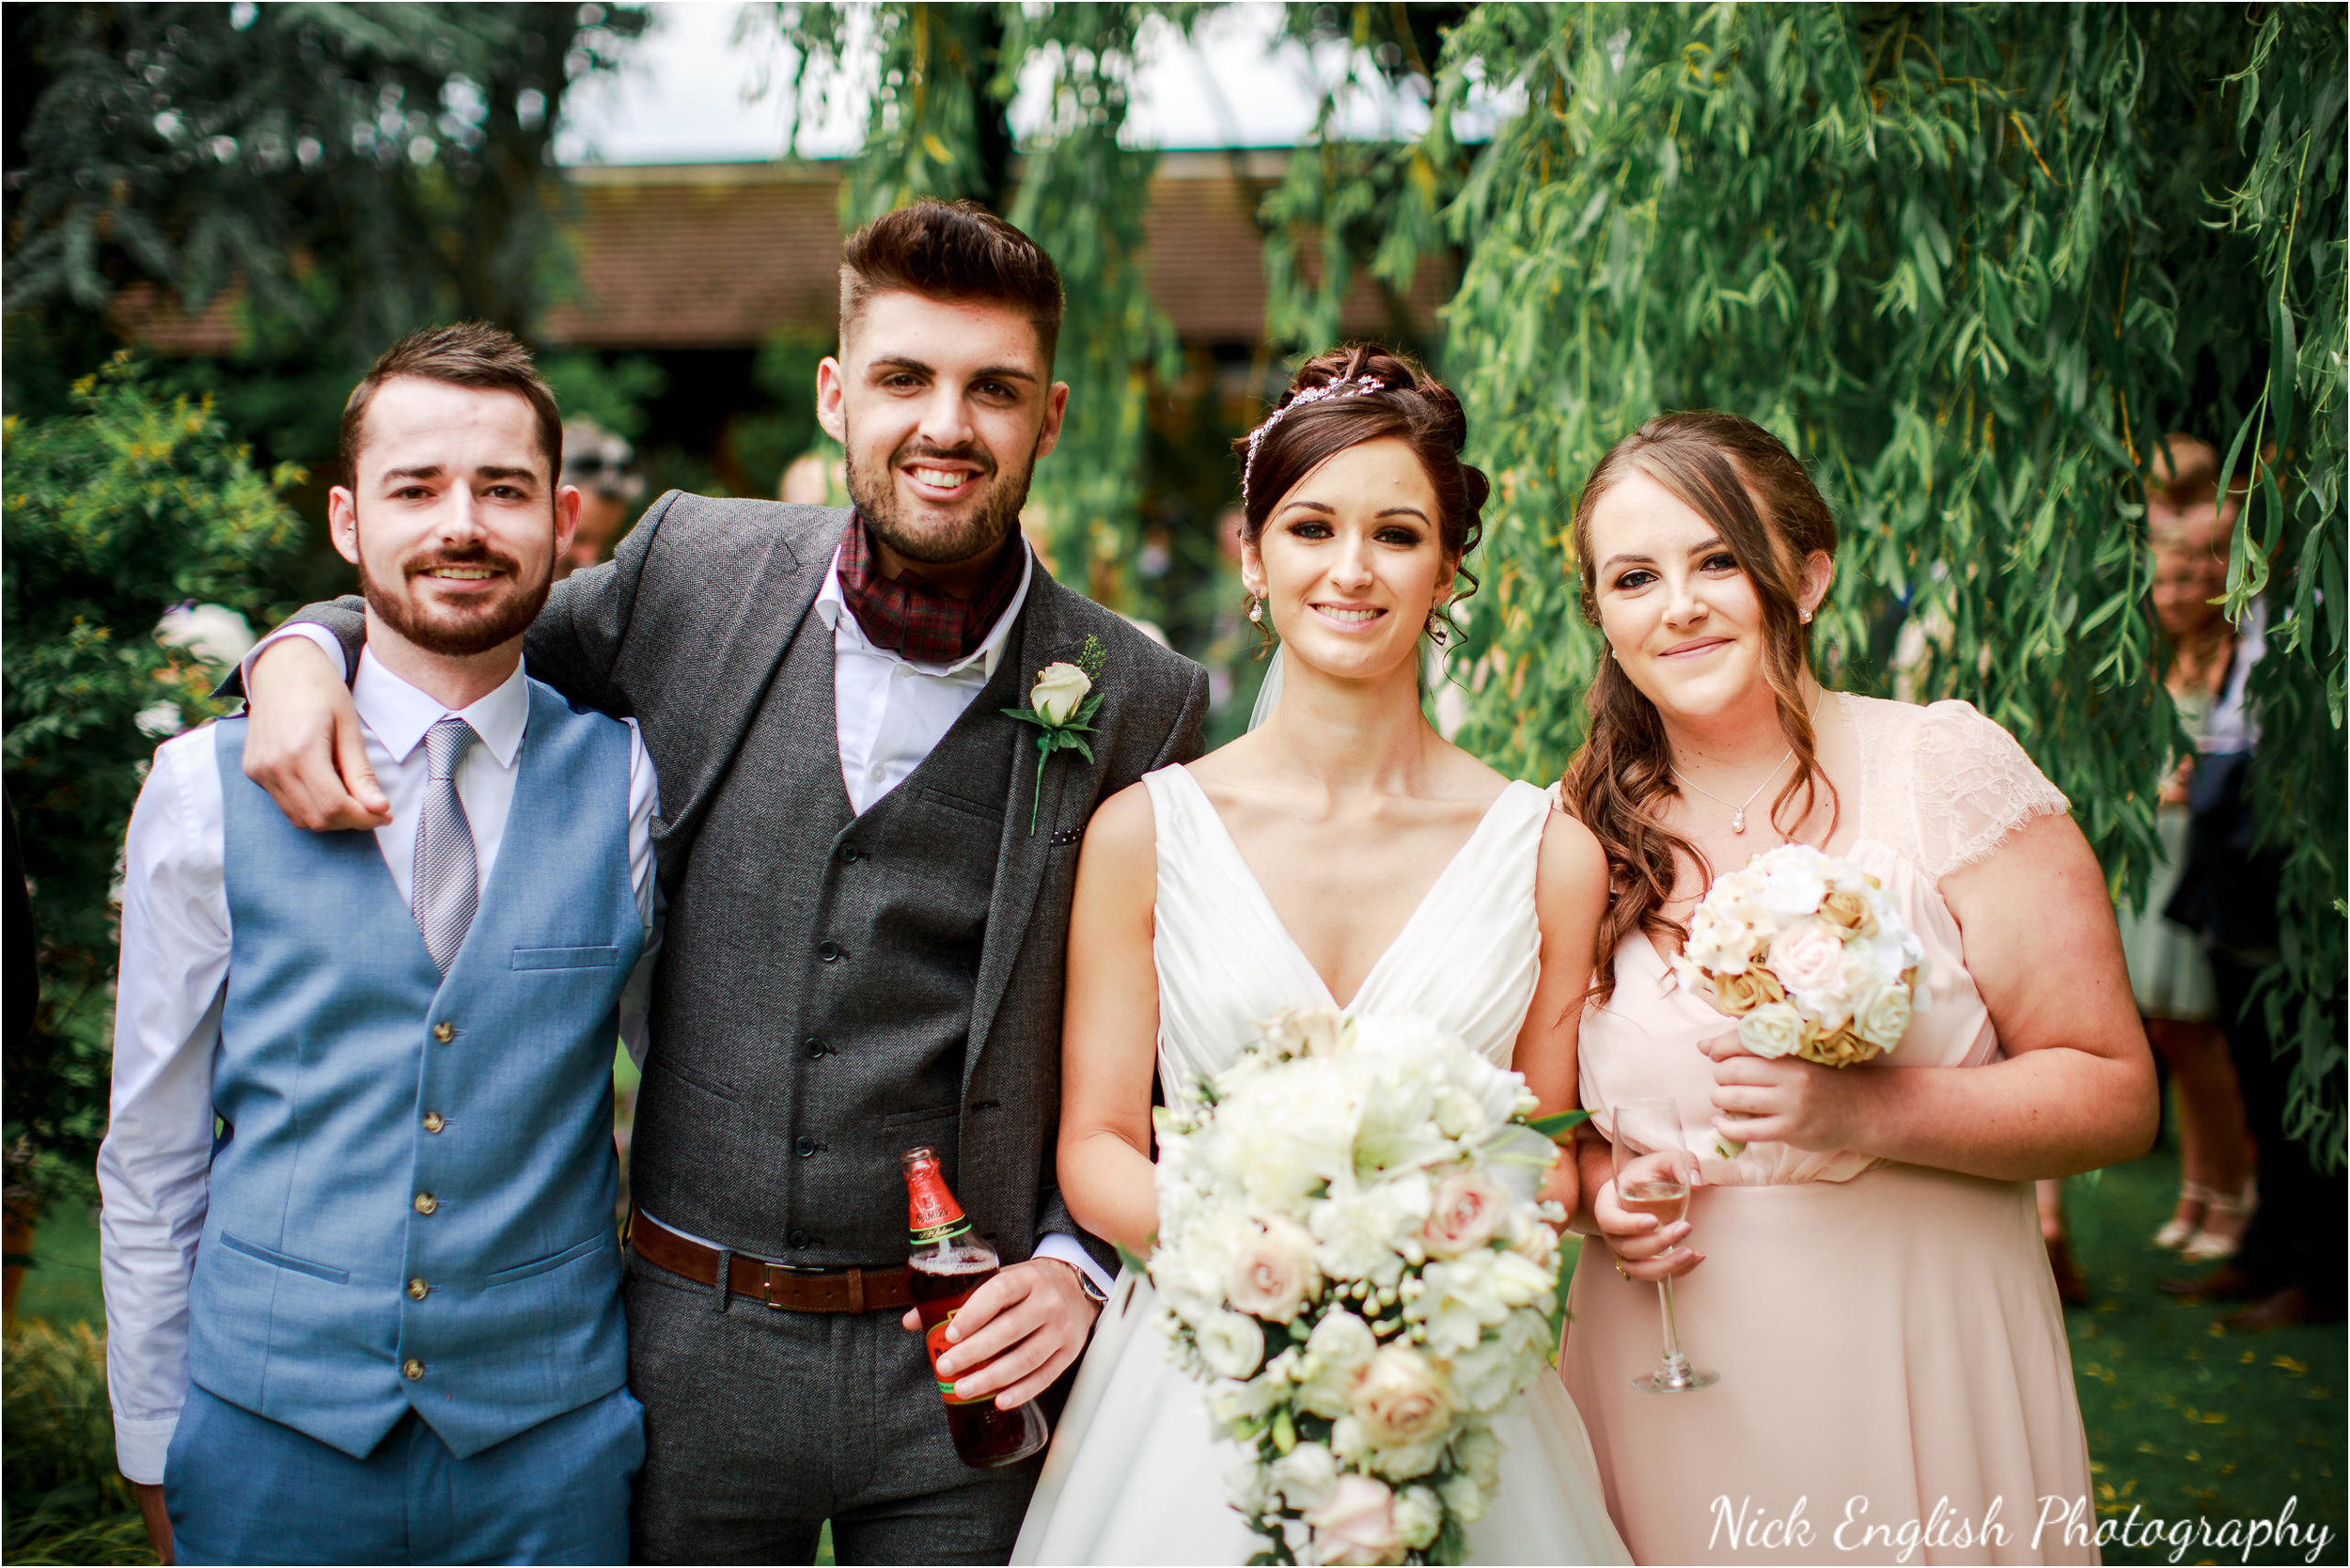 Emily David Wedding Photographs at Barton Grange Preston by Nick English Photography 138jpg.jpeg